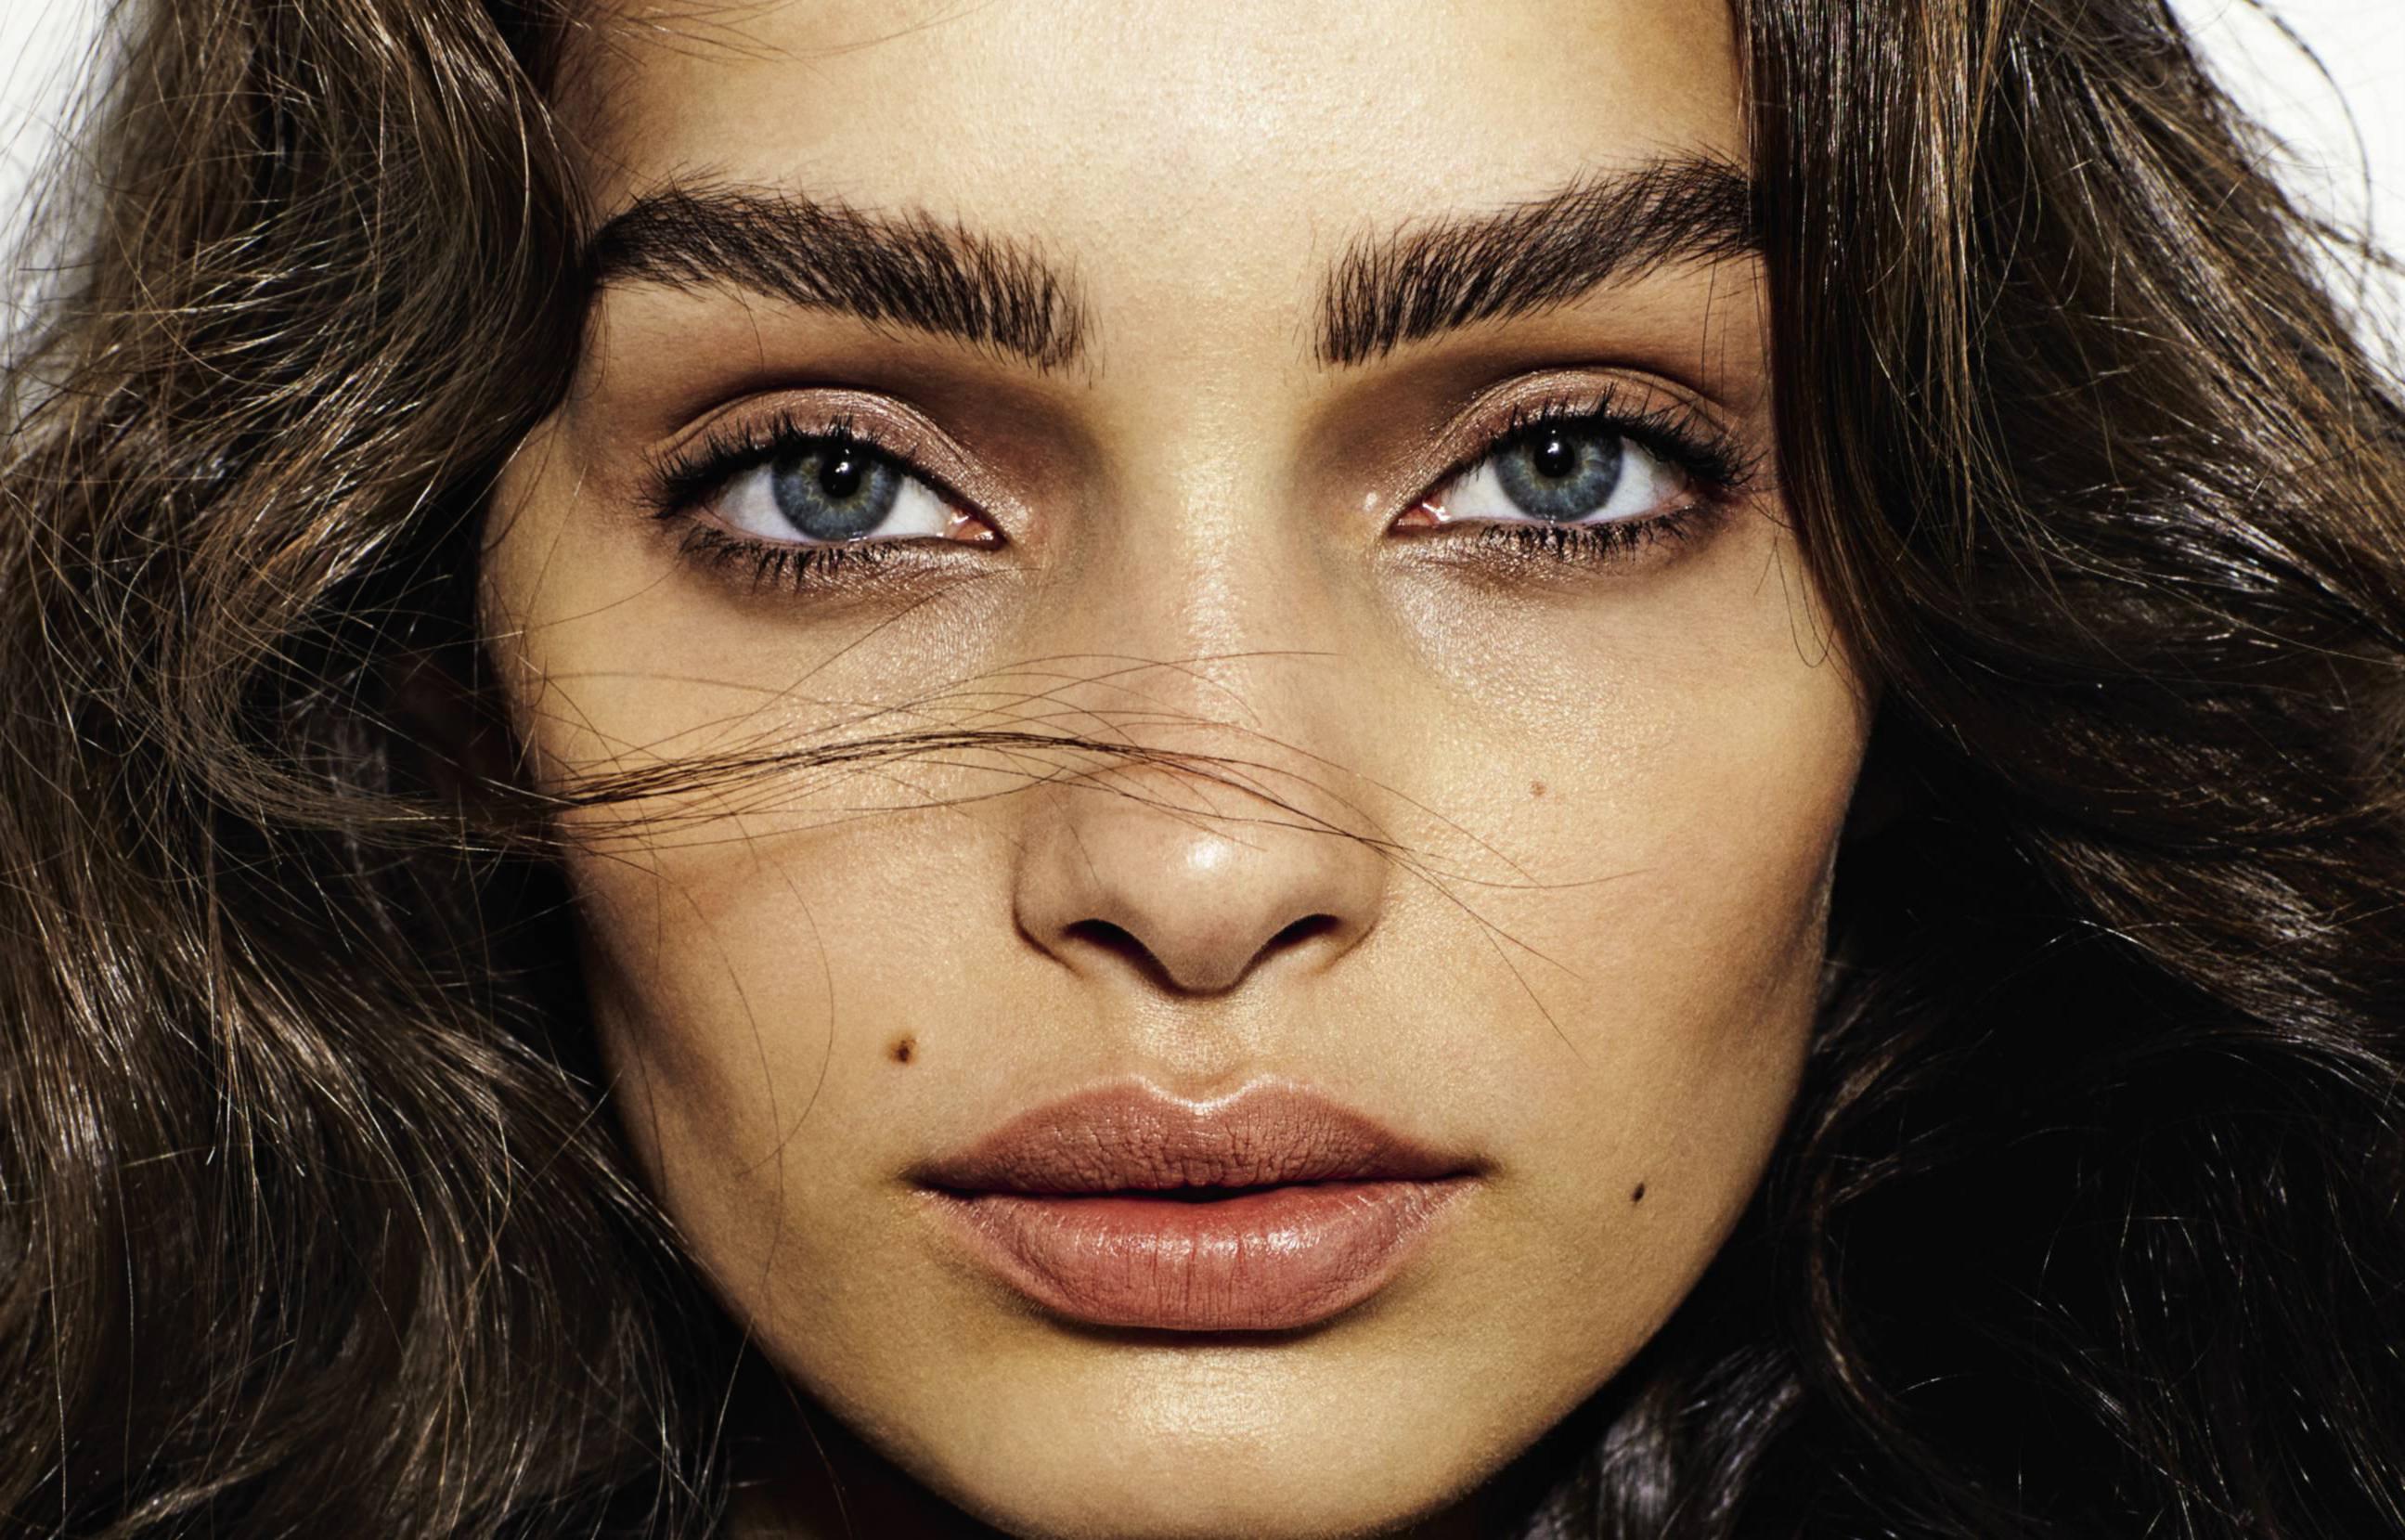 luma grothe face wallpaper 59917